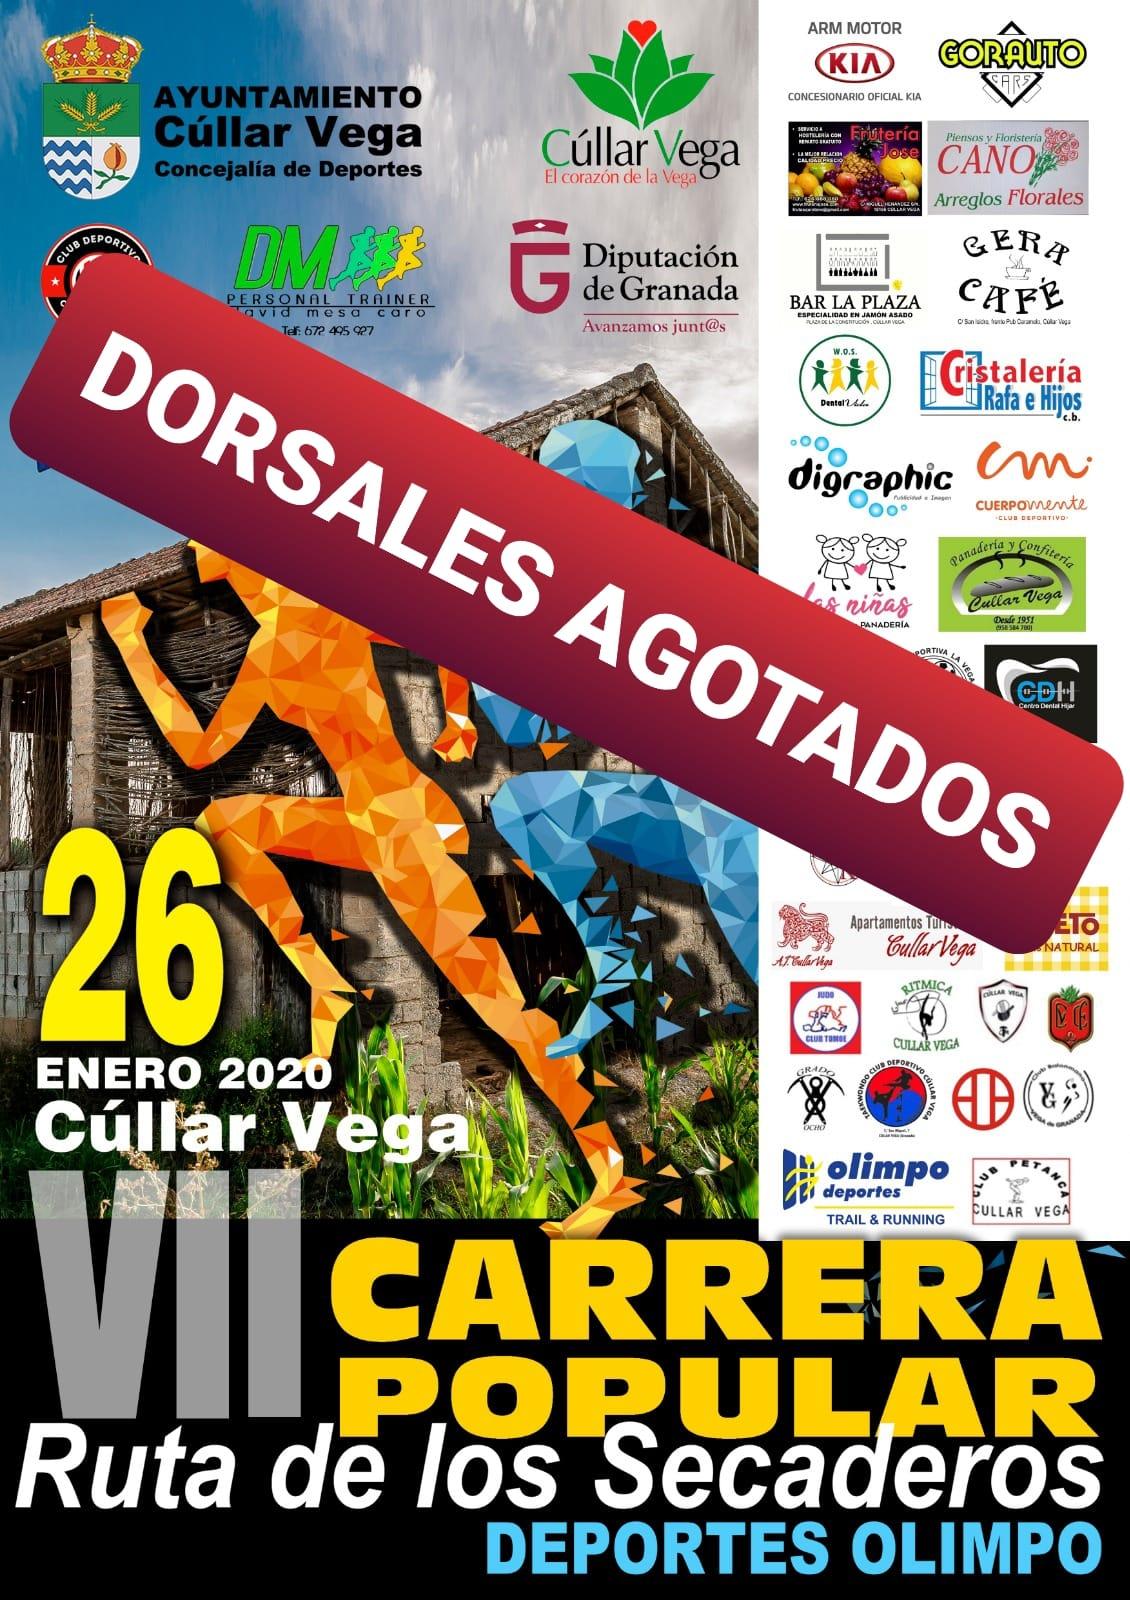 DORSALES AGOTADOS - RUTA DE LOS SECADEROS